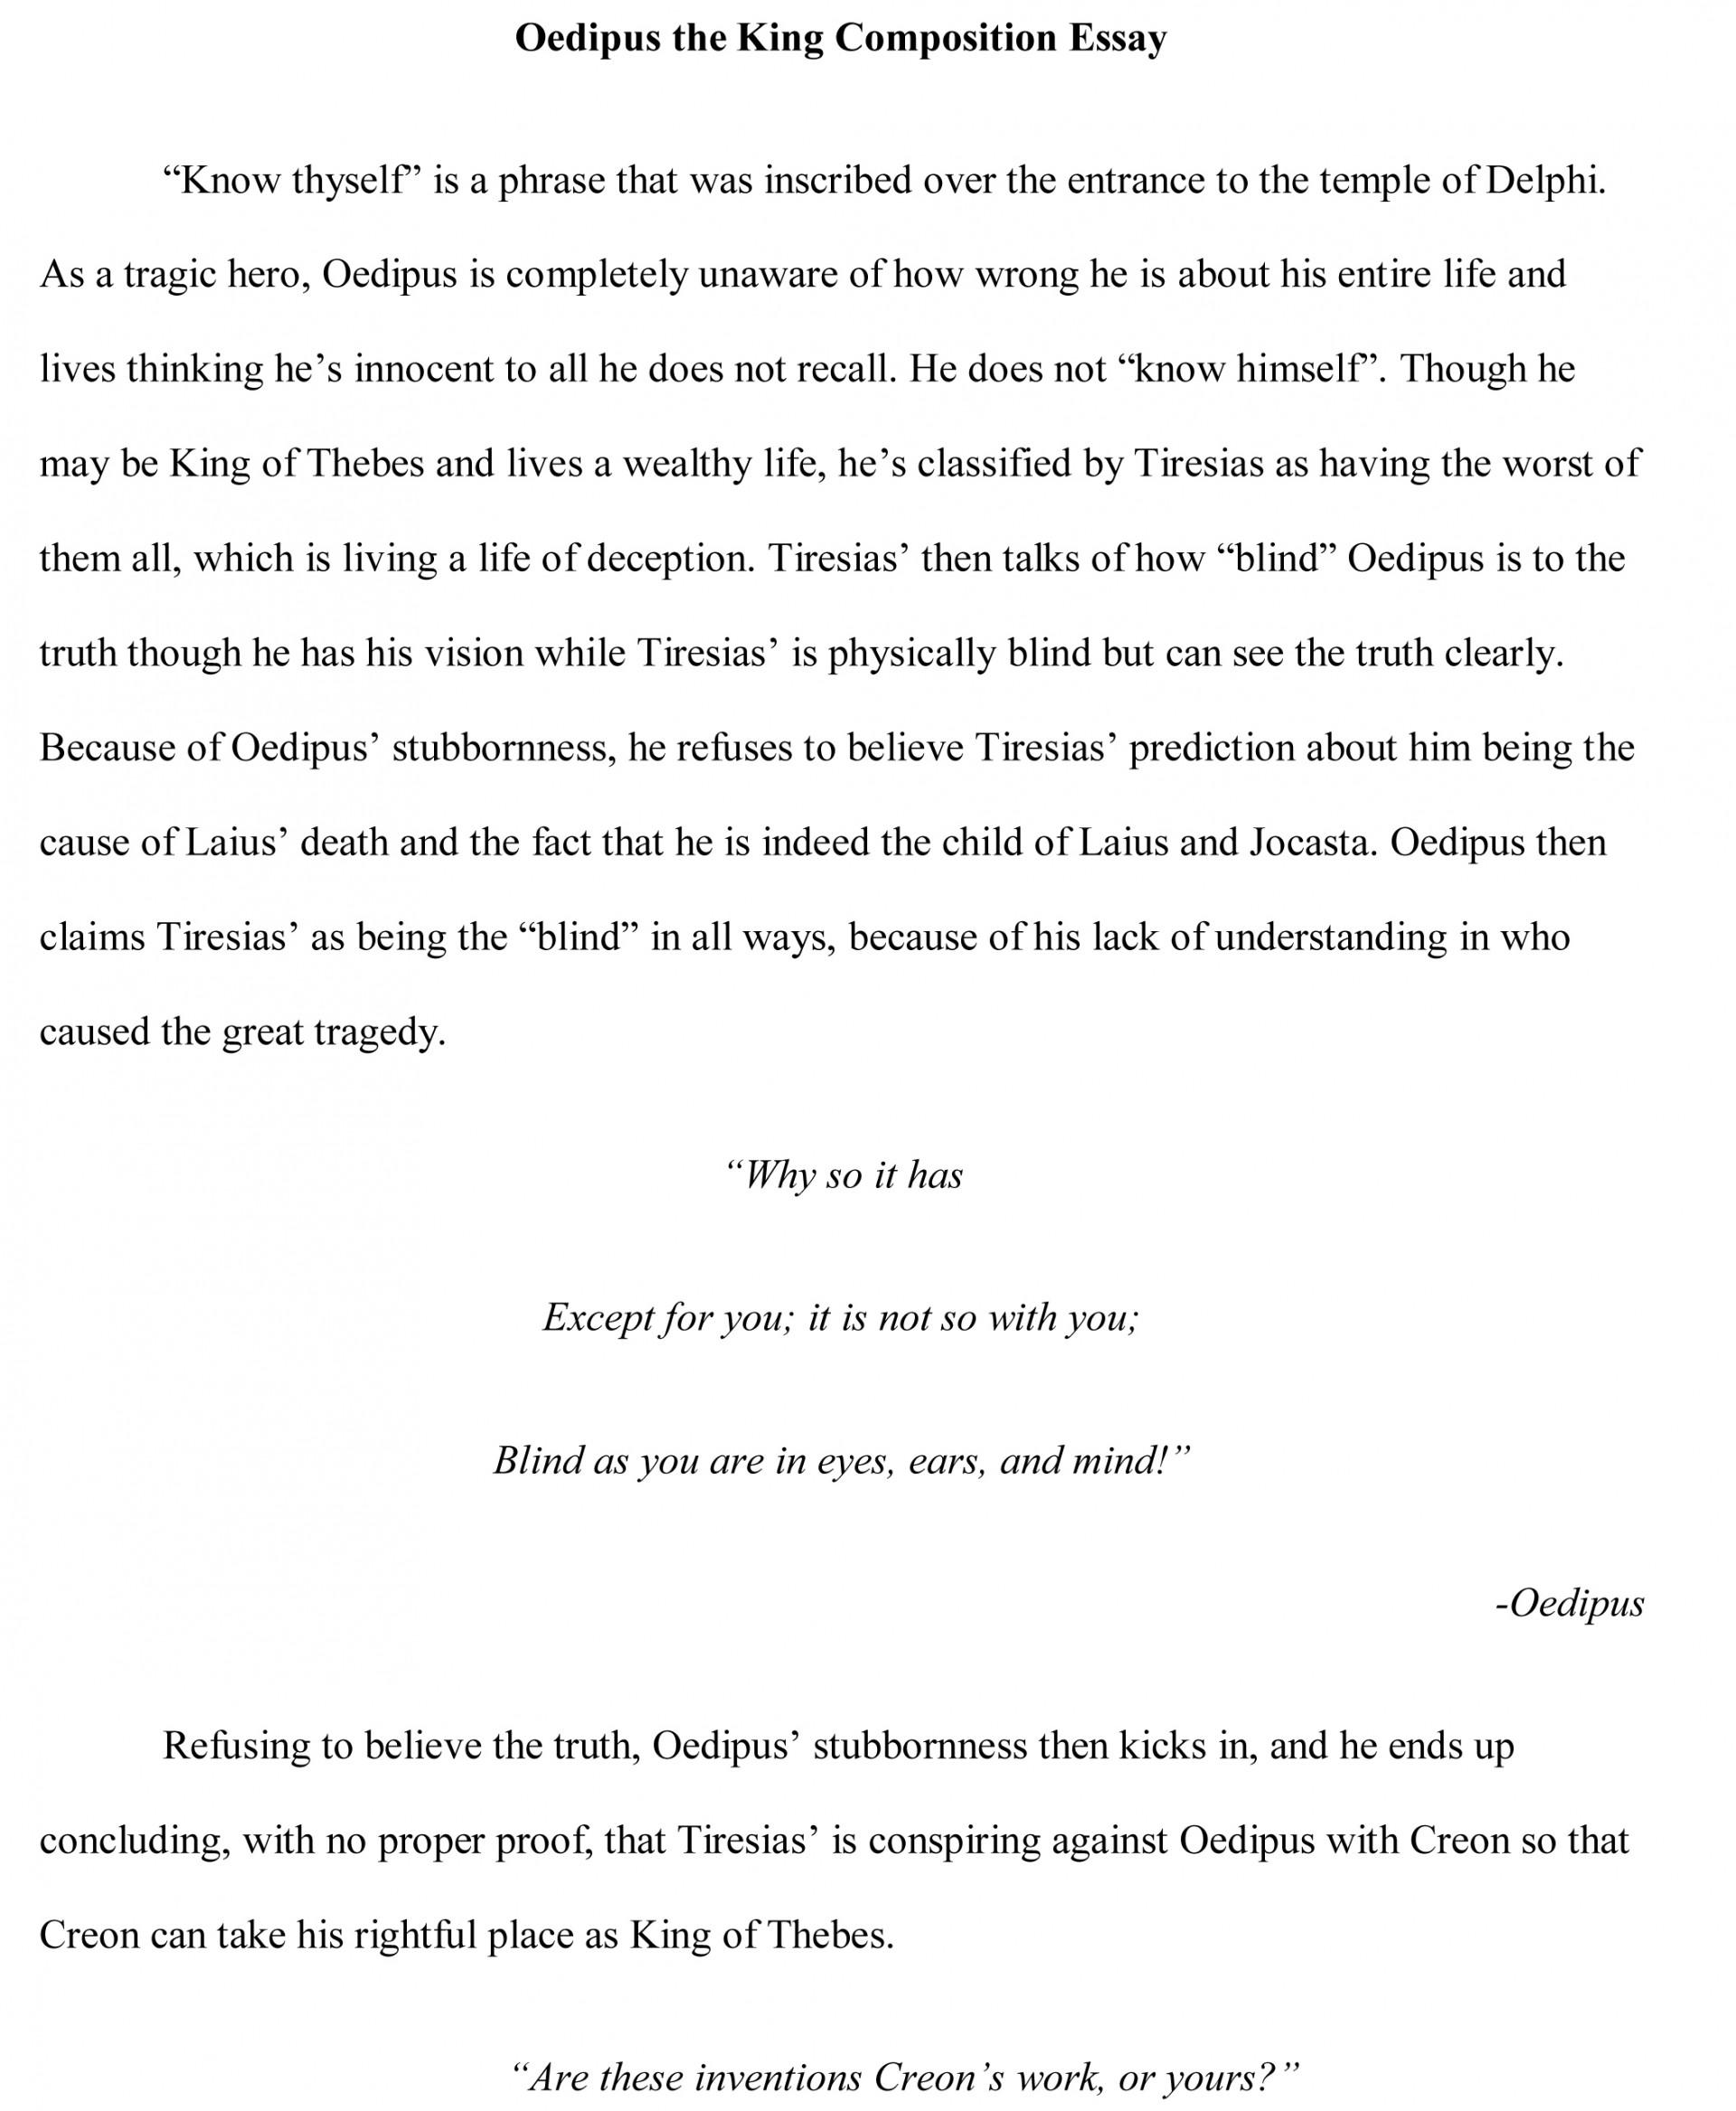 008 Oedipus Essay Free Sample Argumentative Hooks Incredible Hook Examples Pdf 1920